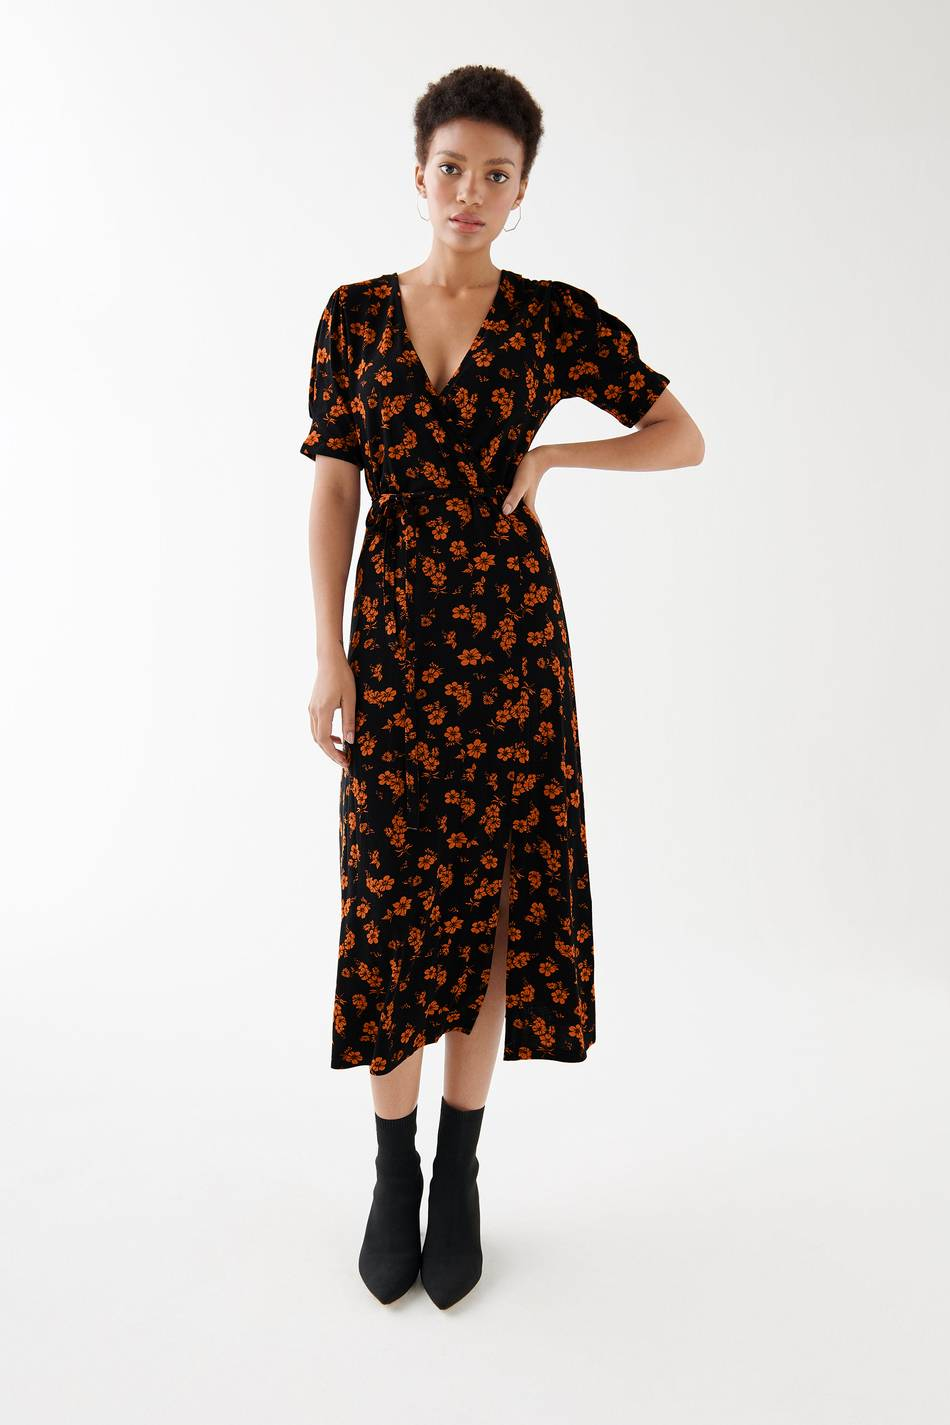 Gina Tricot Ida wrap dress